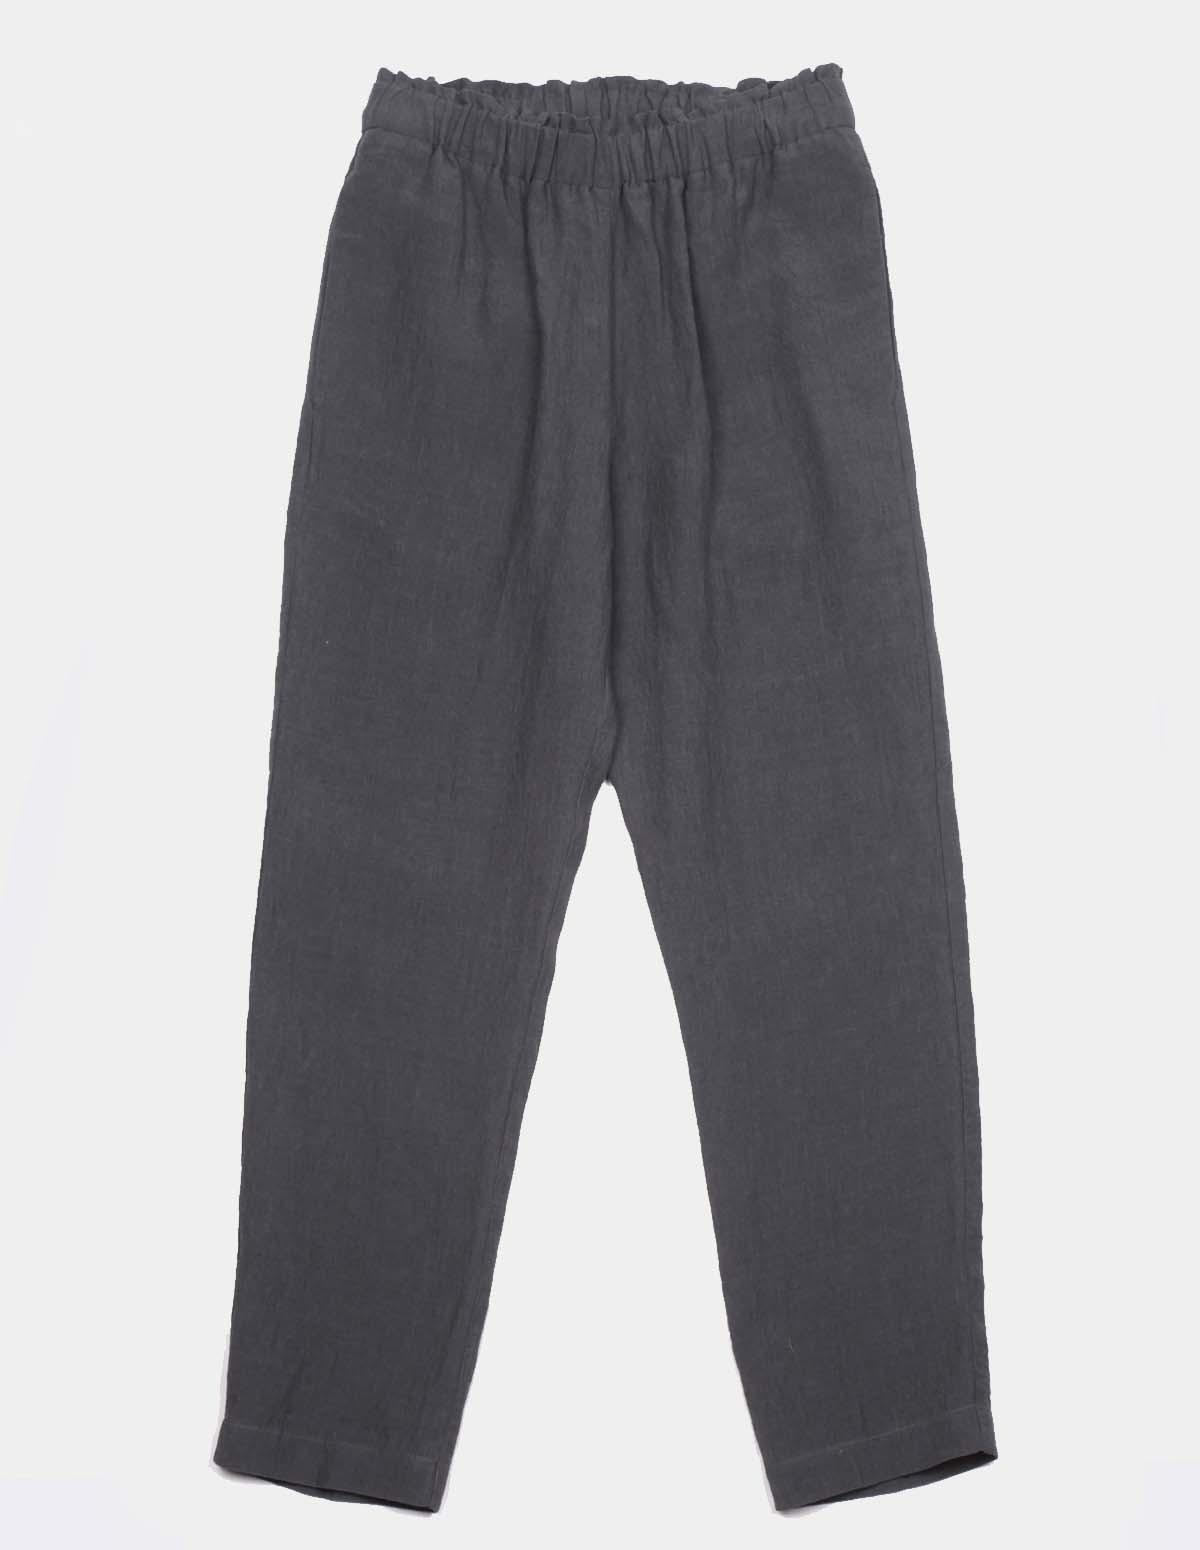 Pom 7123/50751 Pants - ANTHRA 98